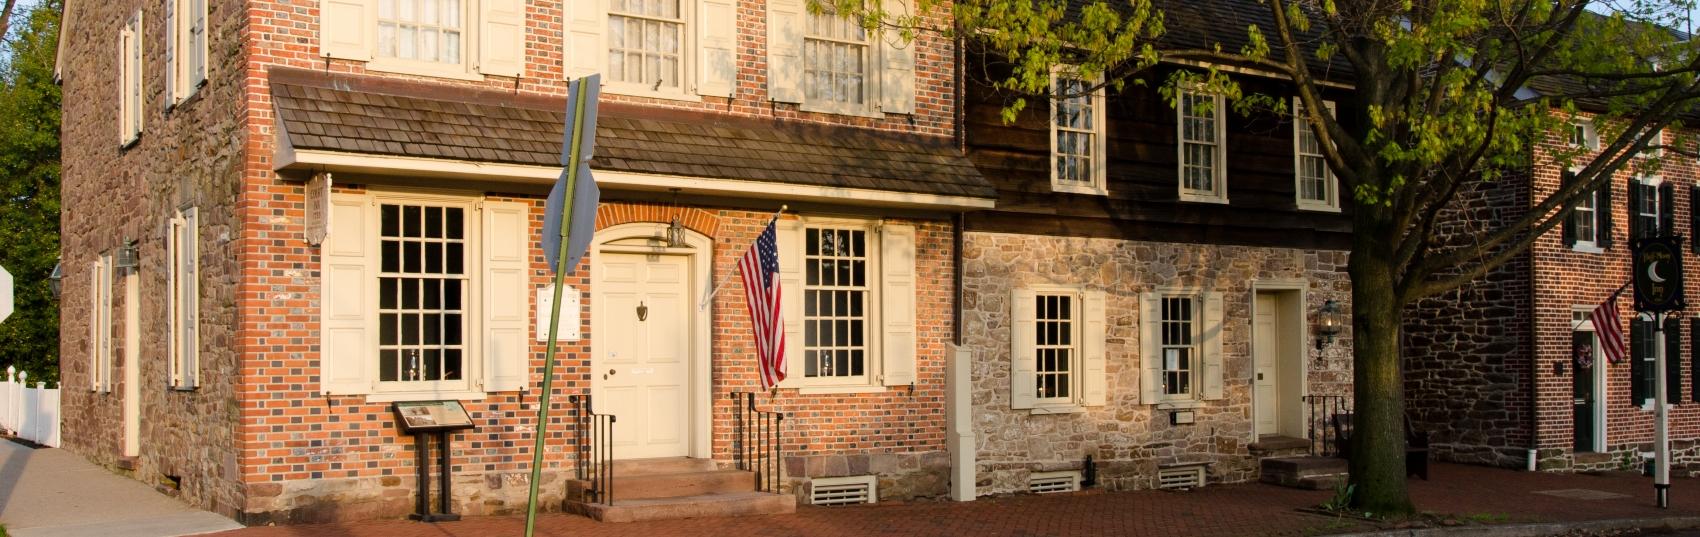 exterior-court-inn